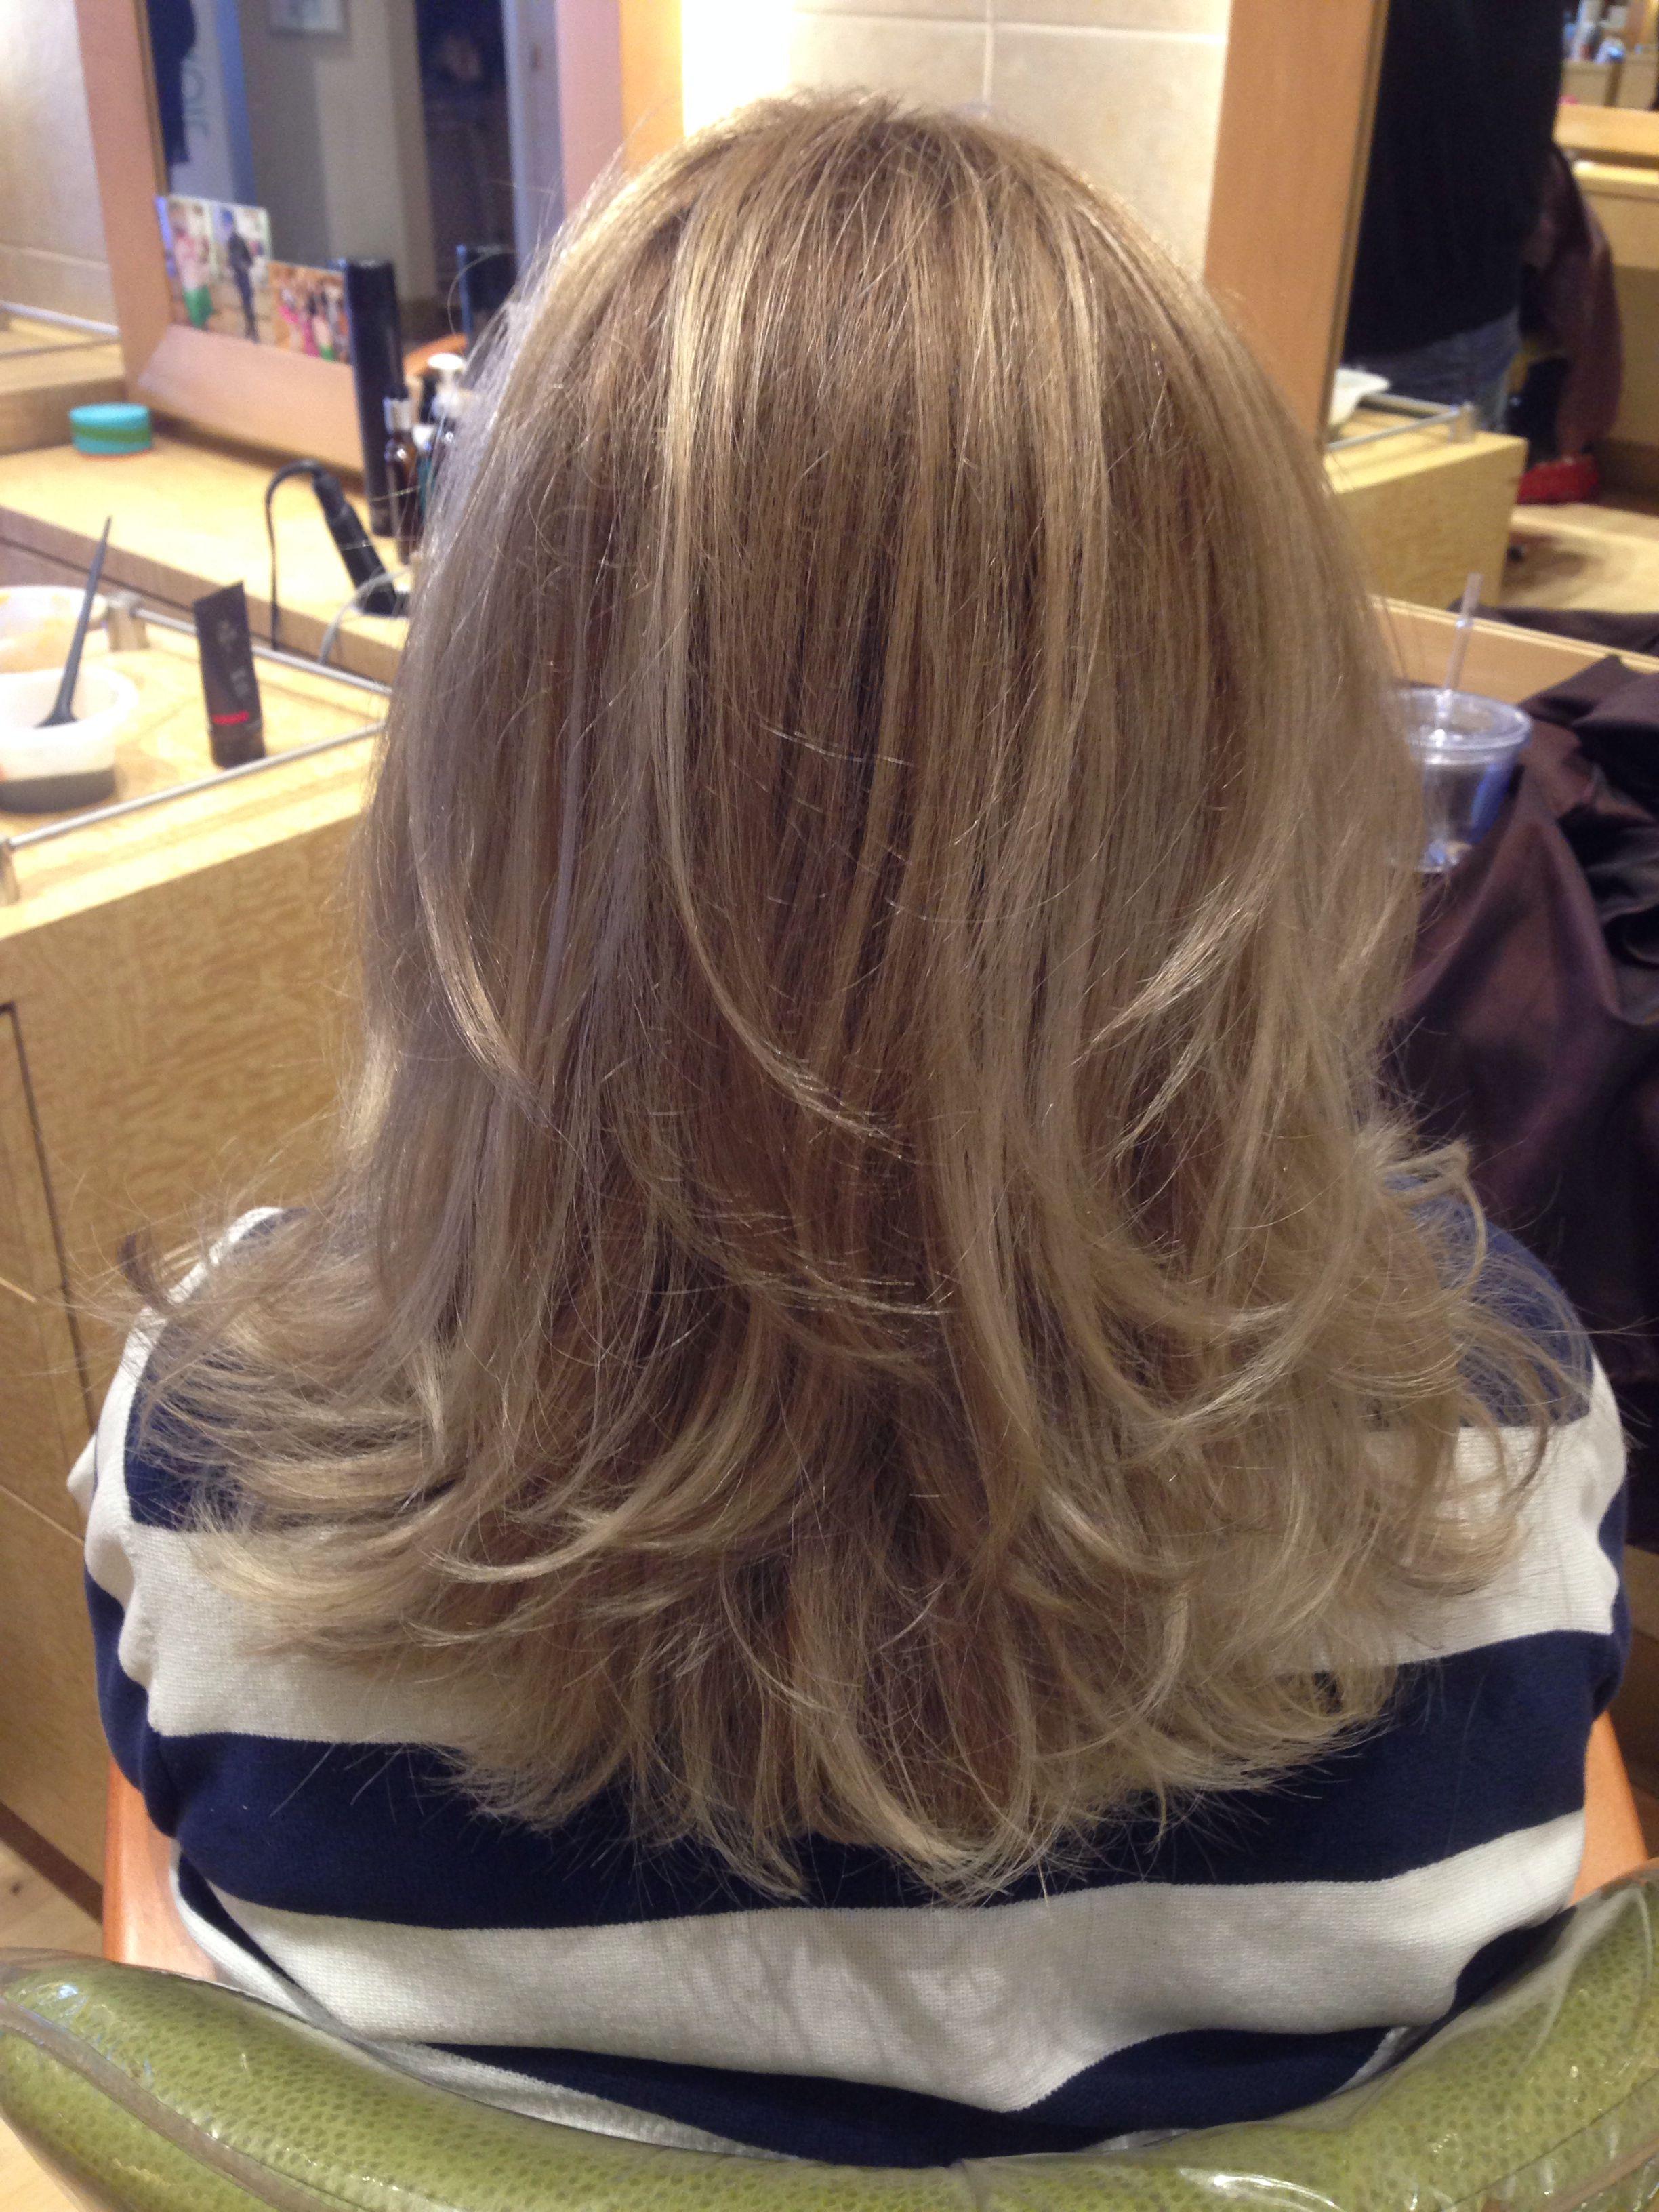 Medium length layered hair cut hair styles and colors in